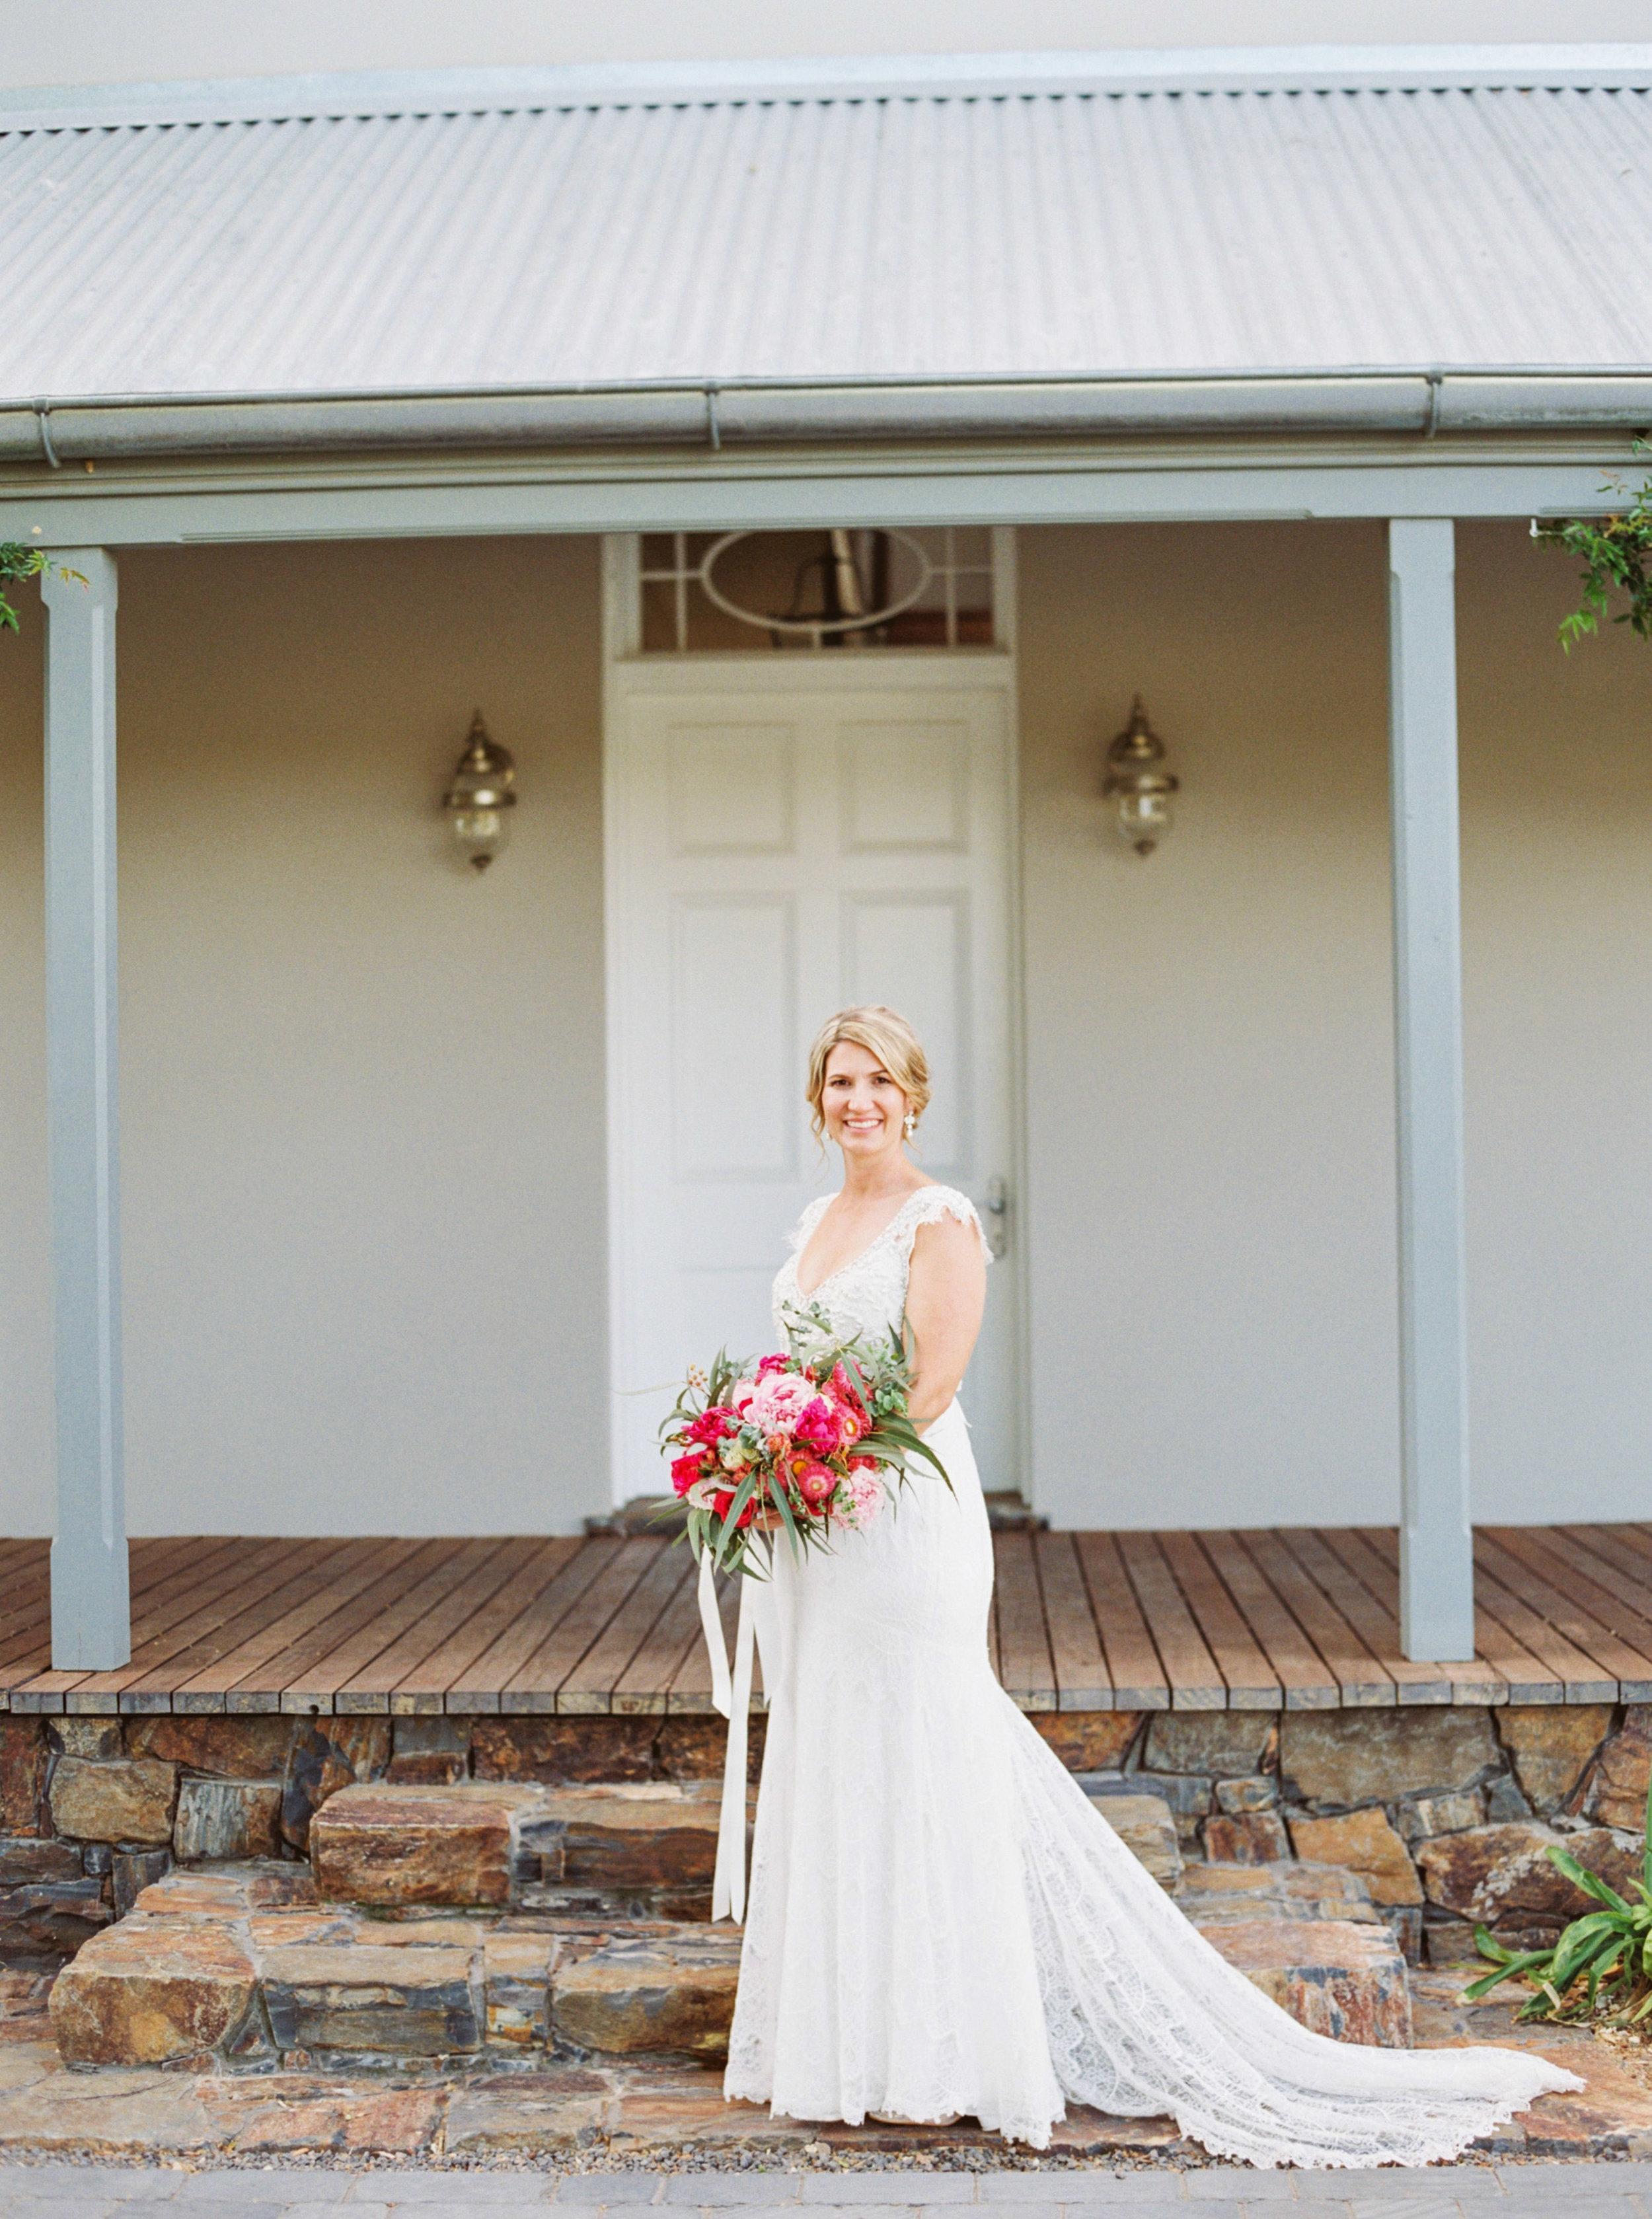 00079- Goonoo Goonoo Station Wedding Tamworth NSW Fine Art Film Wedding Photographer Sheri McMahon_-2.jpg